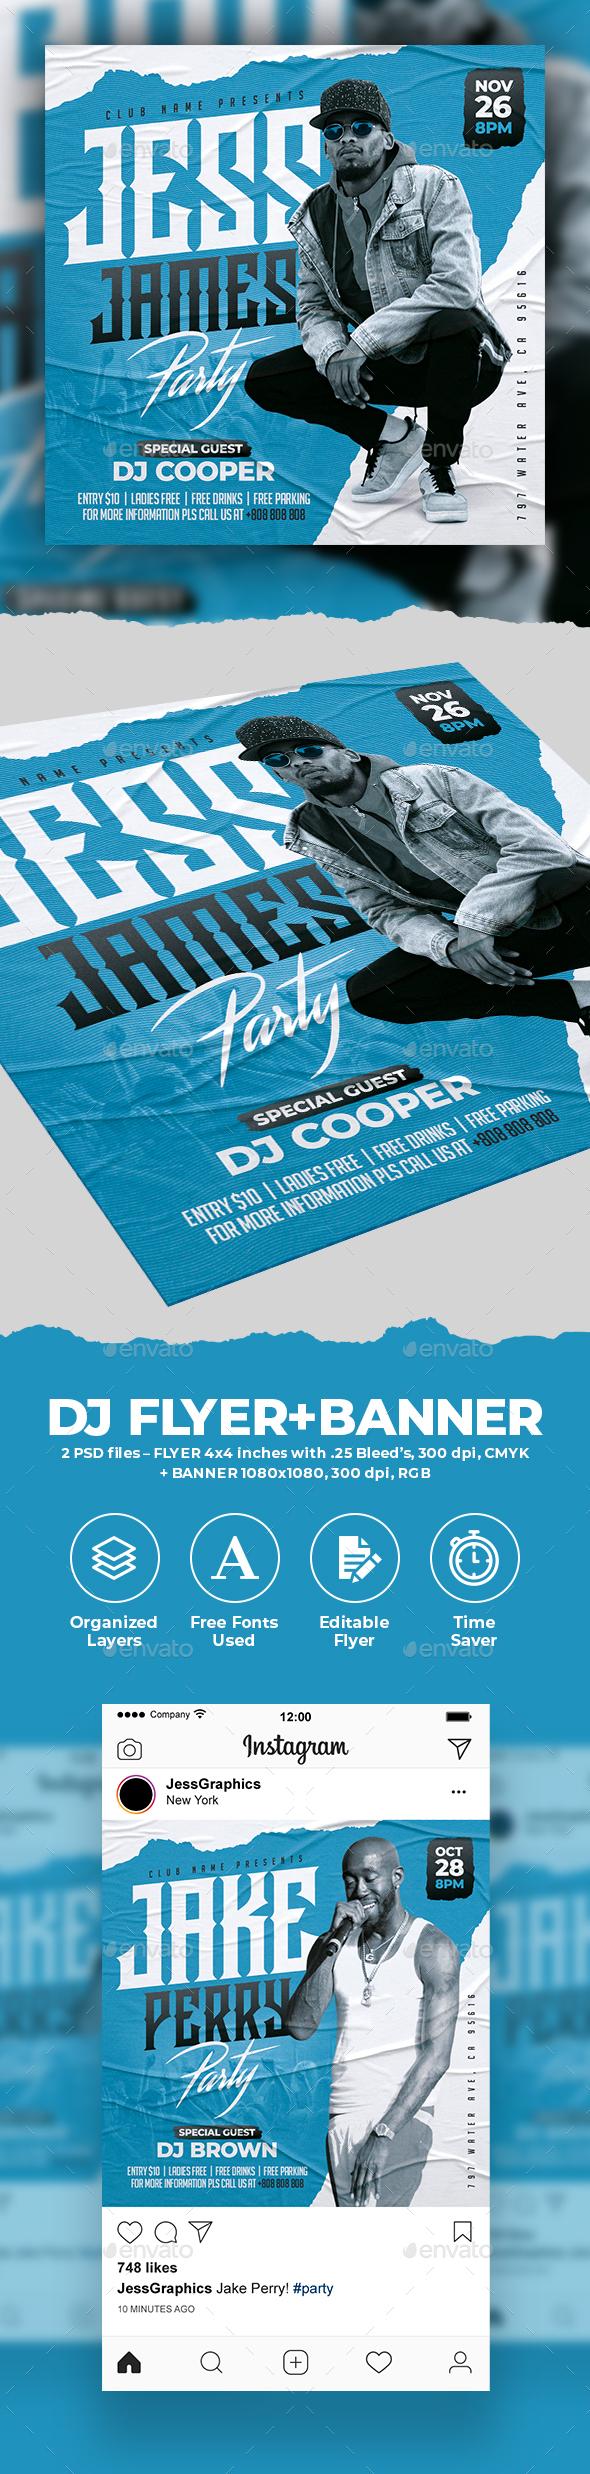 DJ Flyer & Banner